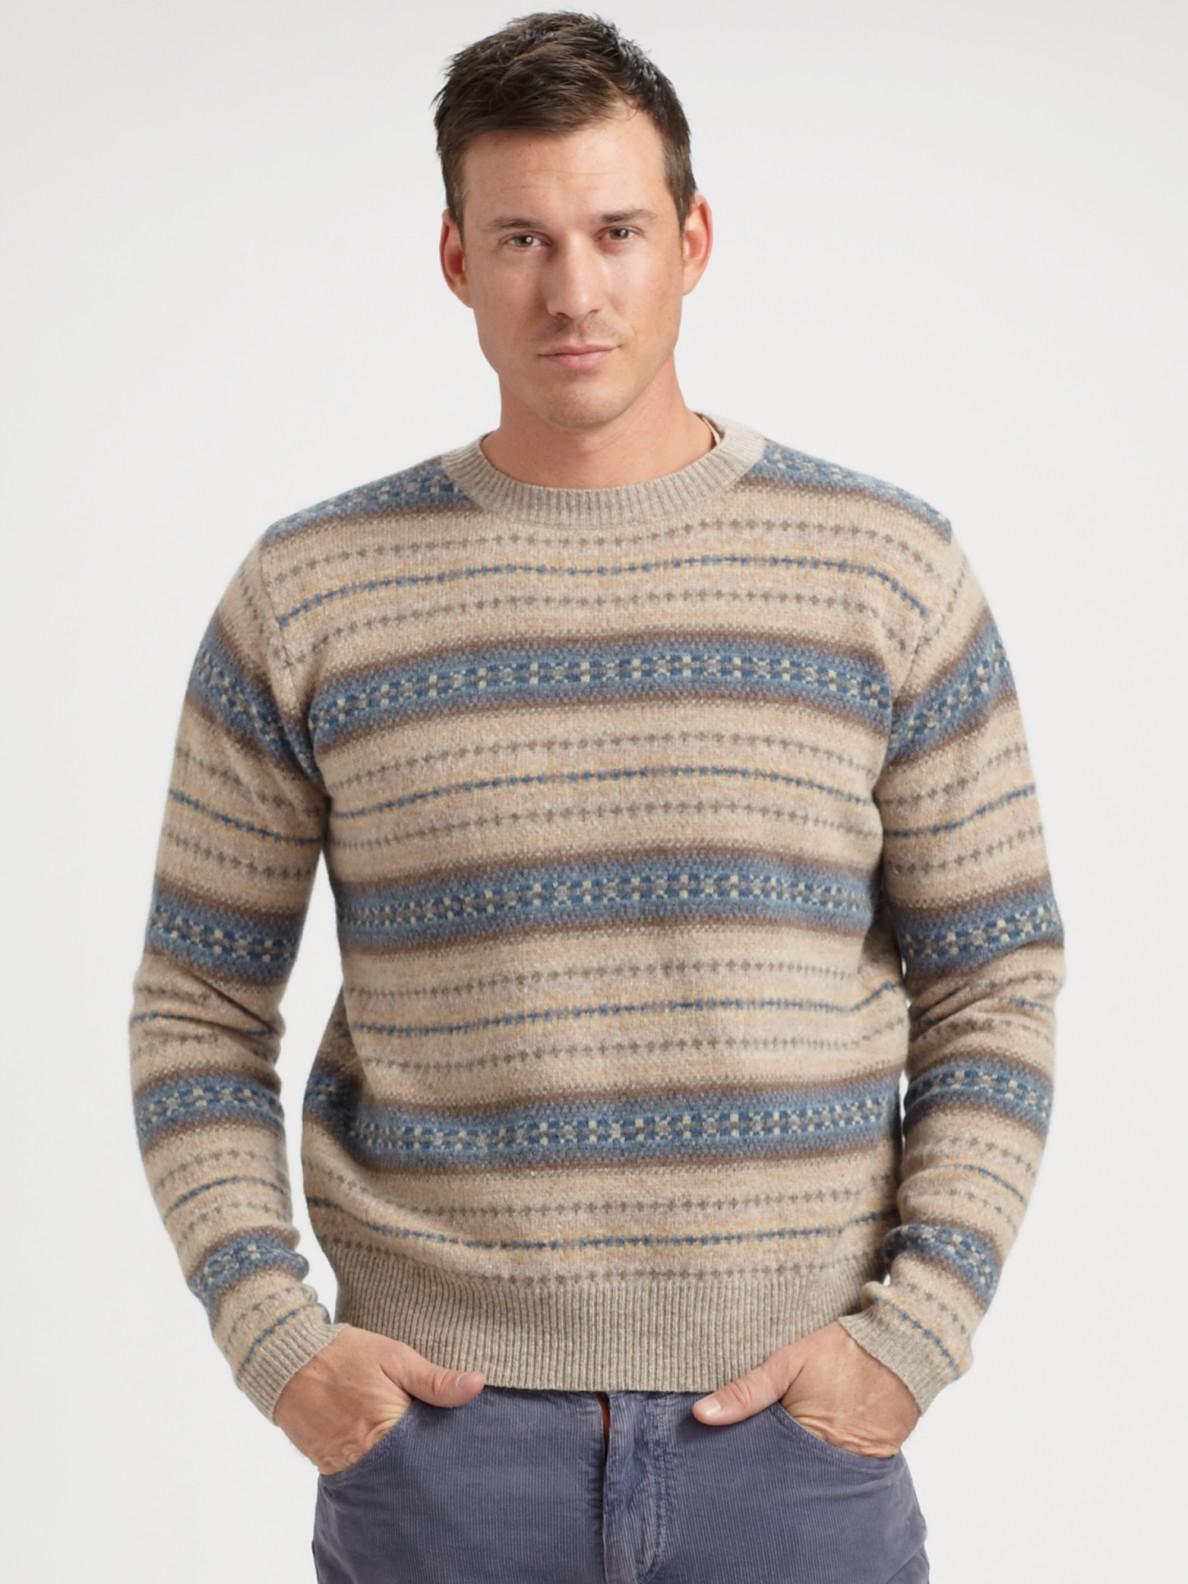 Gant rugger Fair Isle Sweater in Brown for Men   Lyst